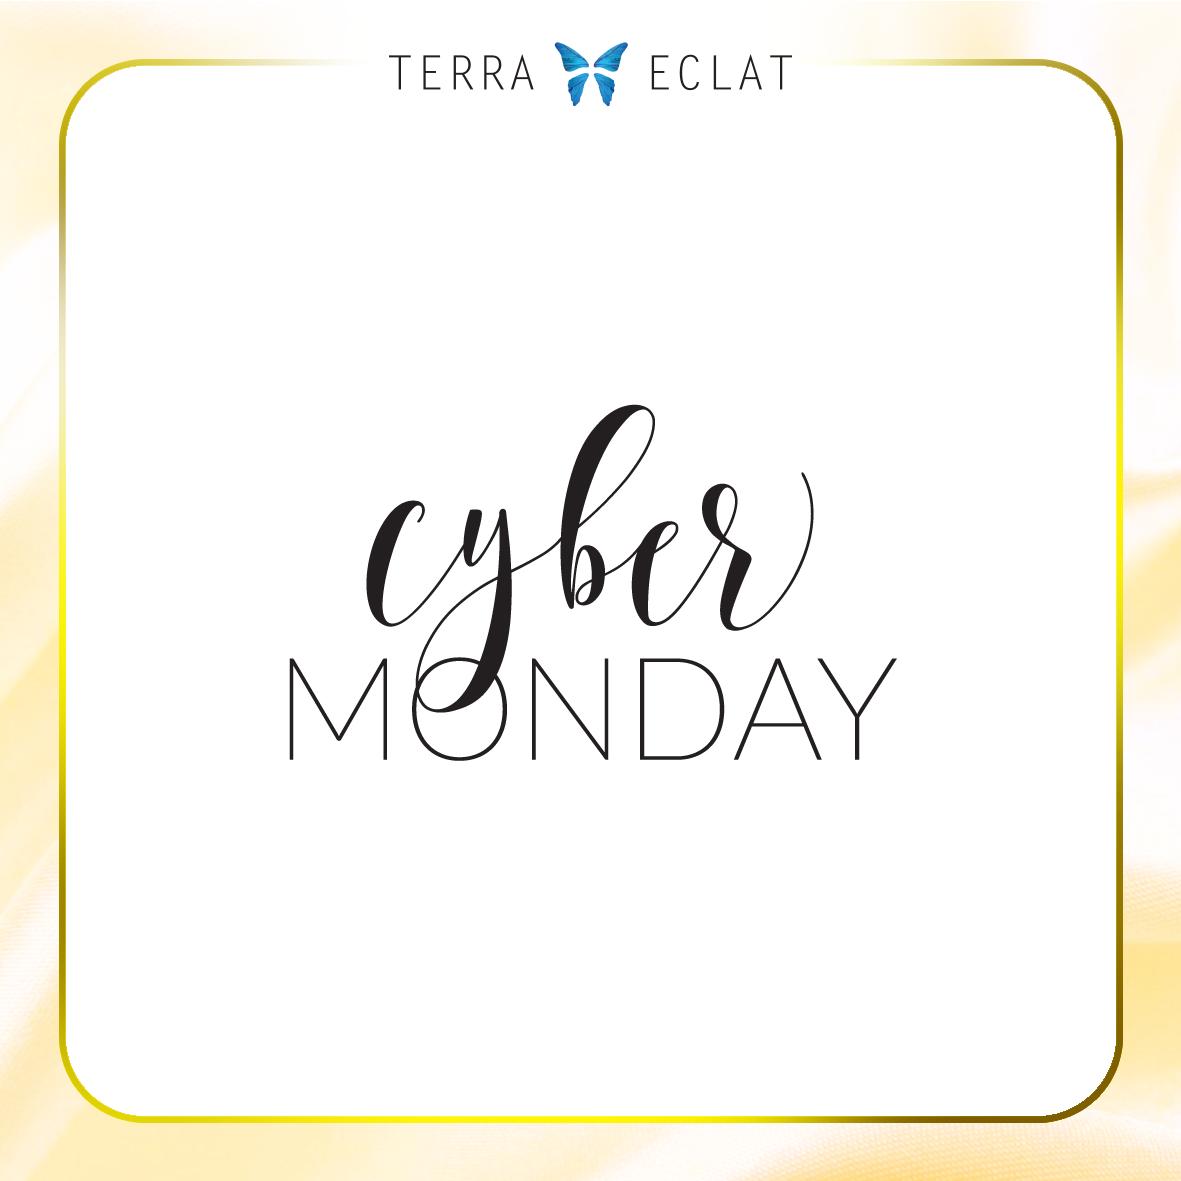 Cyber Monday Sale Instock Items Special Discount Terraeclat Terraeclatjewelry Butterflyjewelry Balijewelry Naturaljewelry Weddingjewelry Fashionjewe